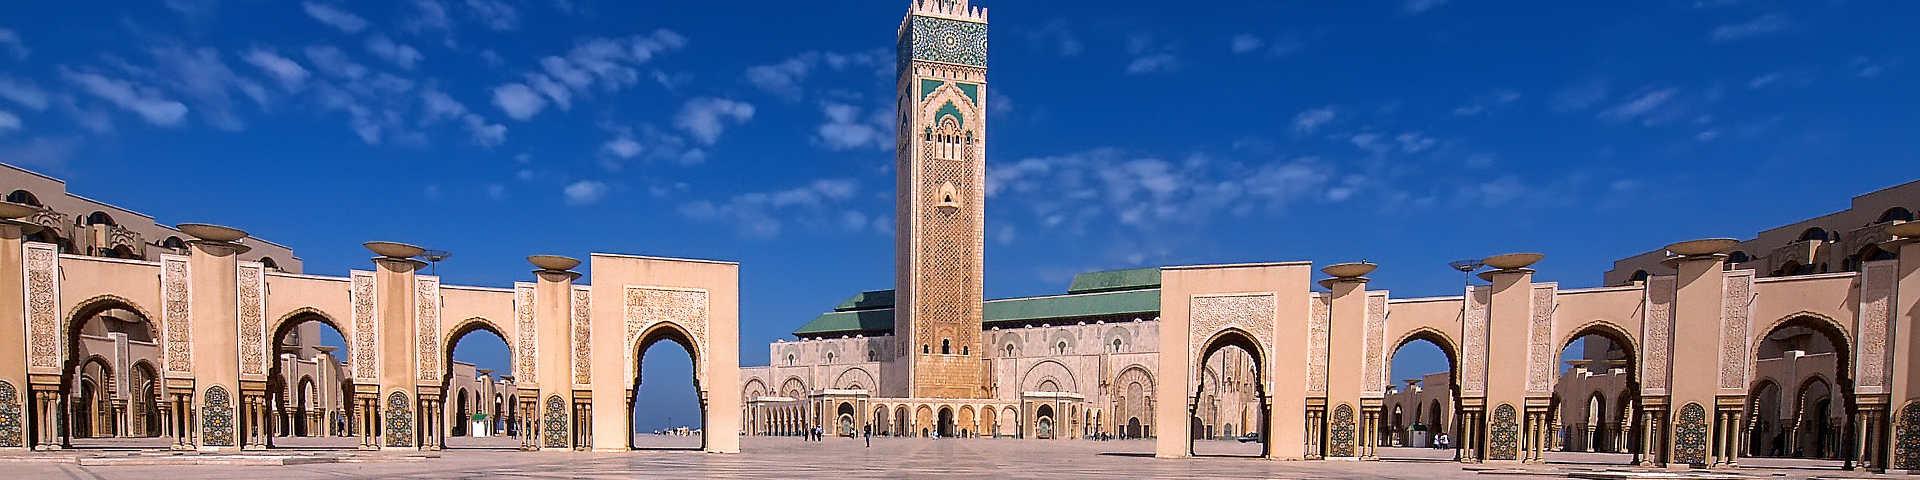 Casablanca hero banner1